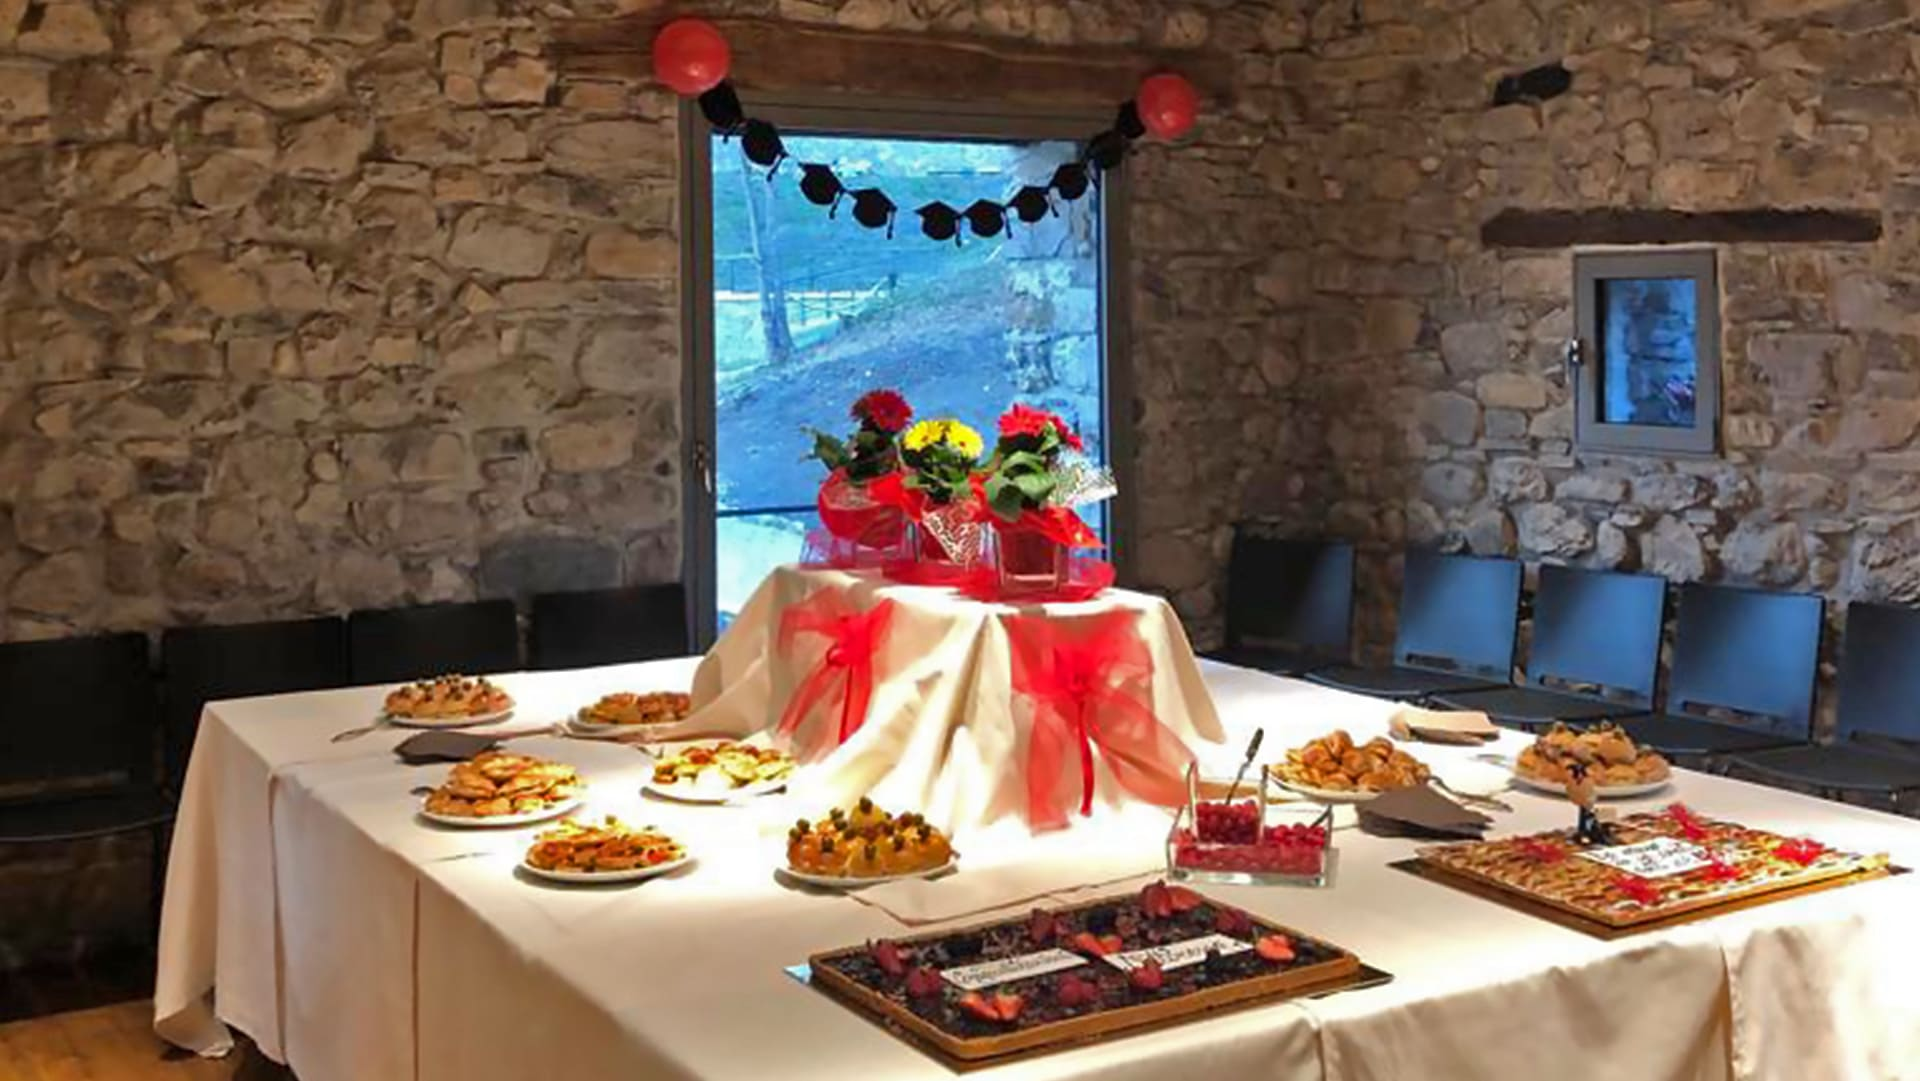 Idee per buffet di laurea: menu, torta, allestimento e location